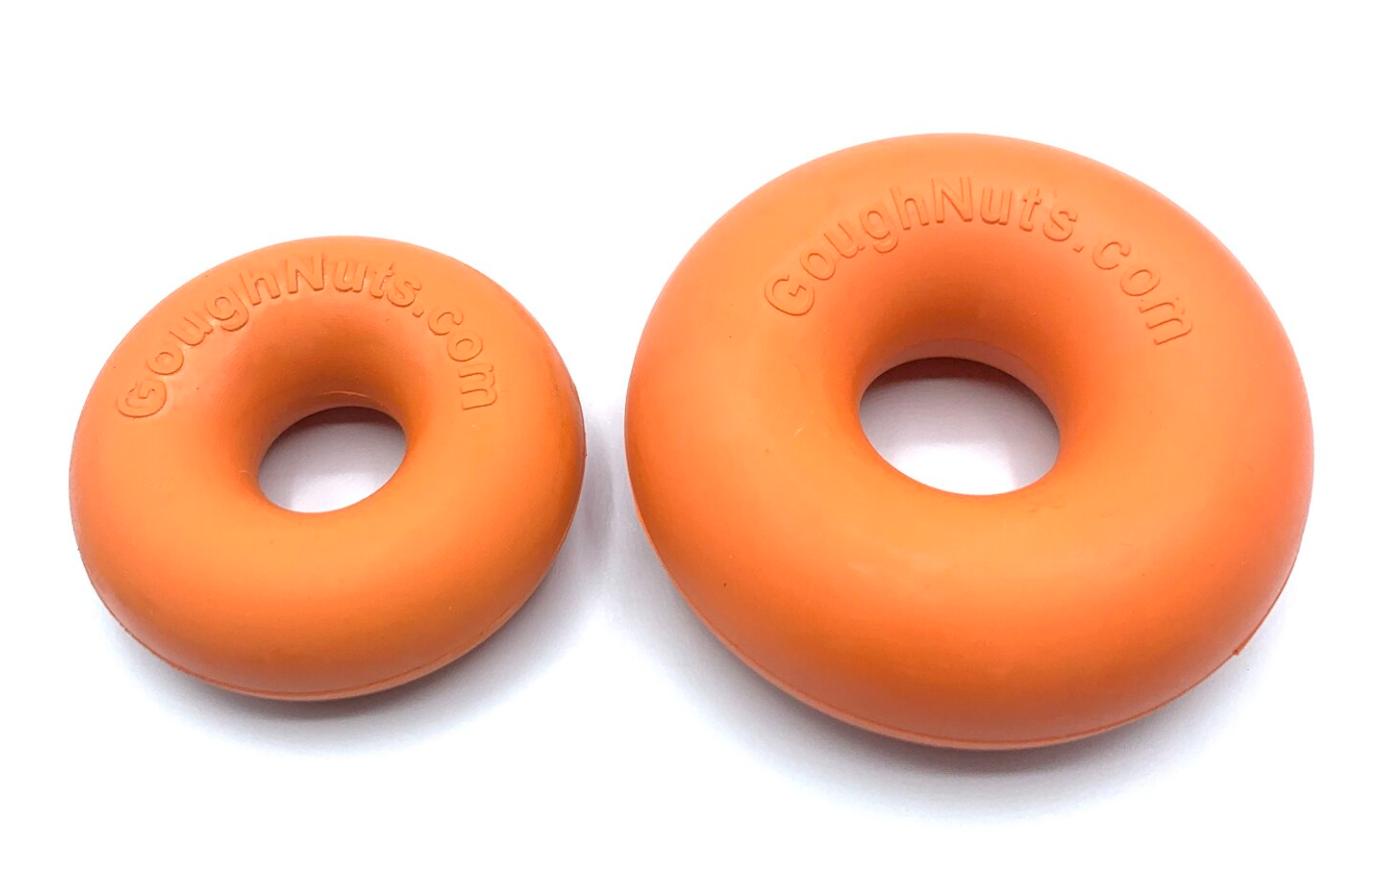 Orange Donut - Goughnut Original